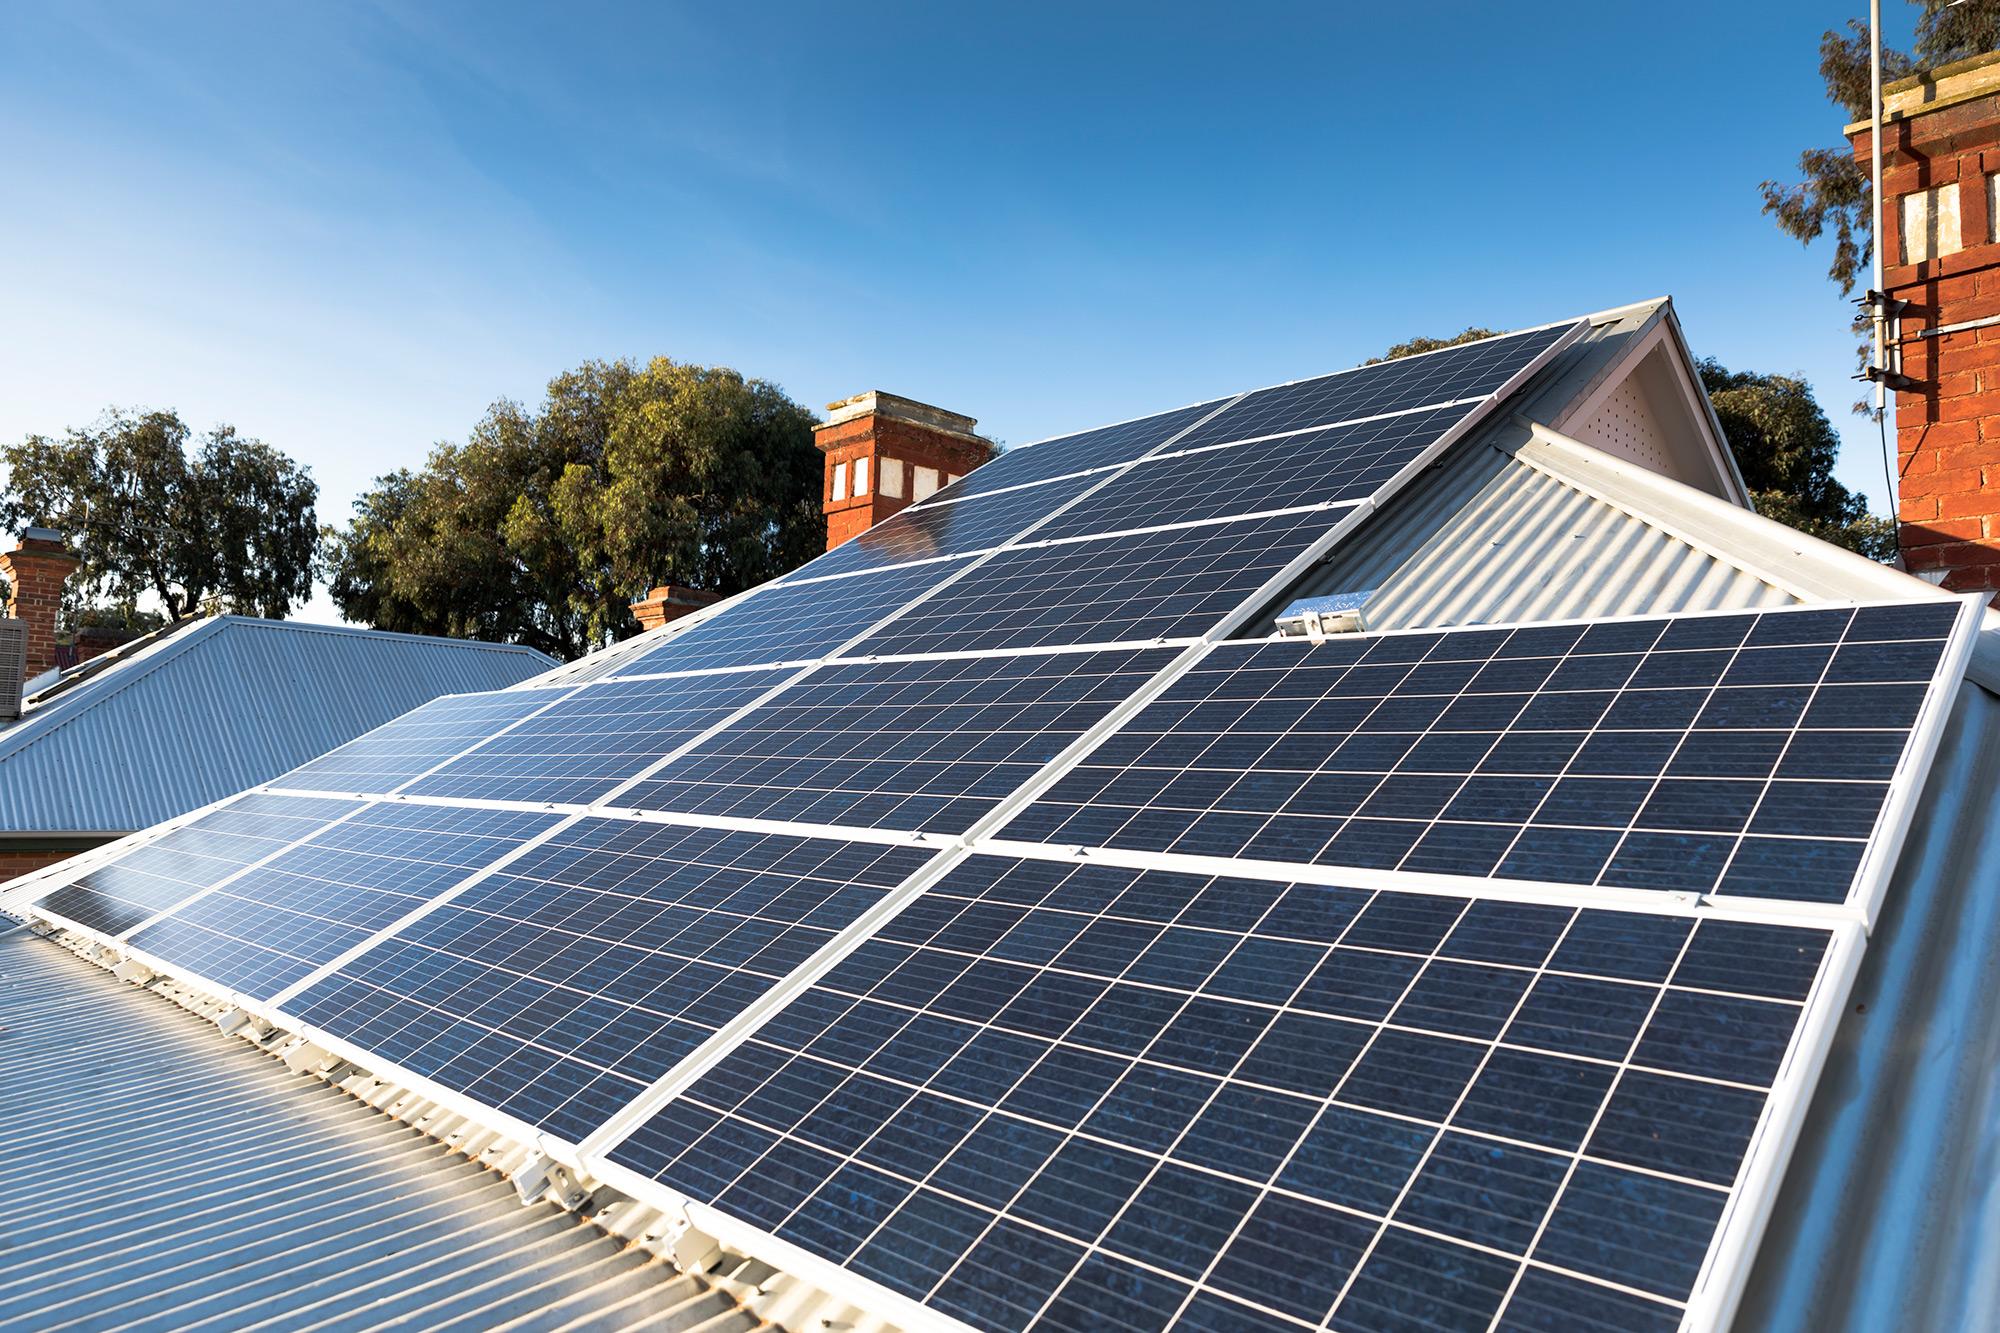 Solar Panel Design And Orientation Goliath Solar